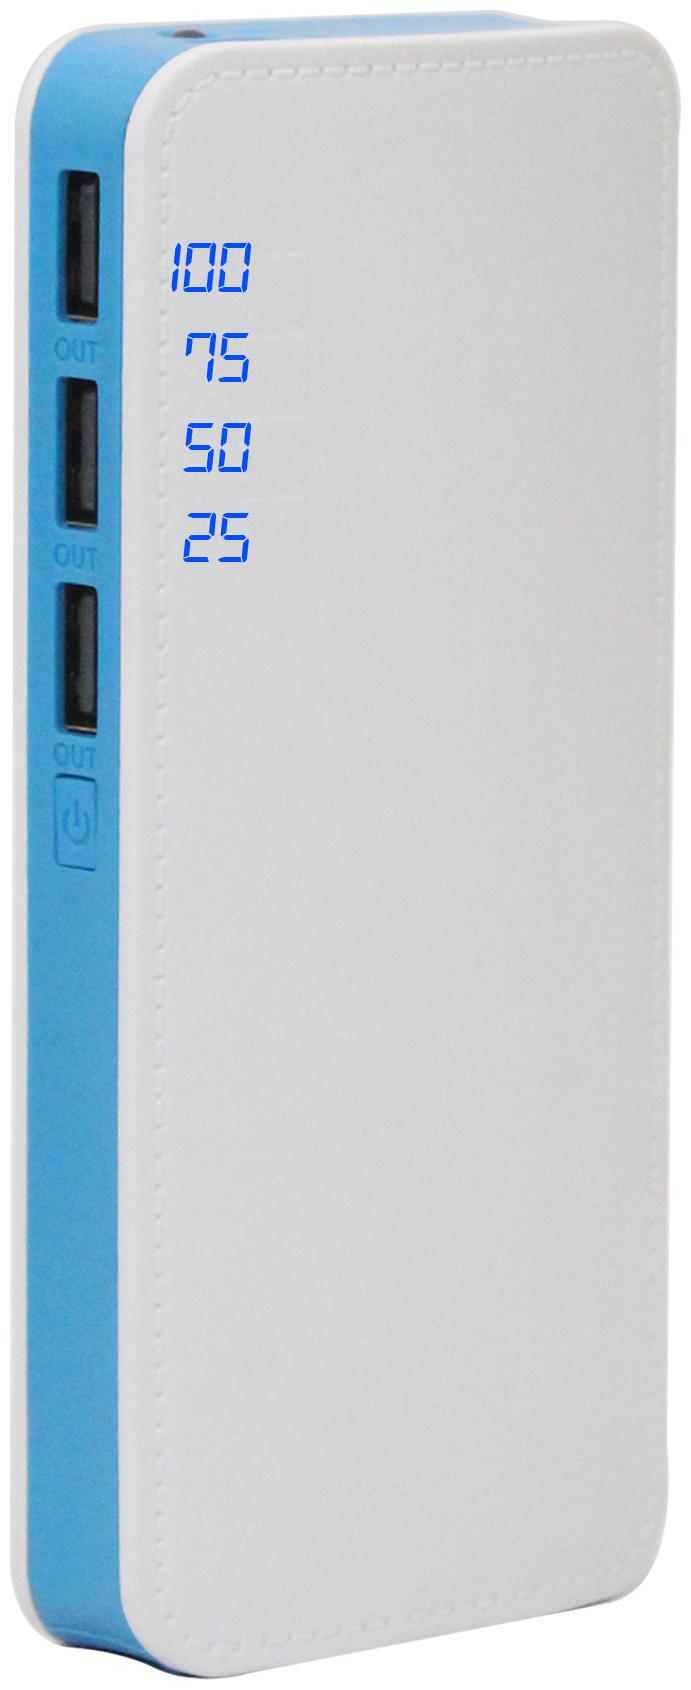 POMICS 15K P6 15000 mAh Power Bank - Blue & White